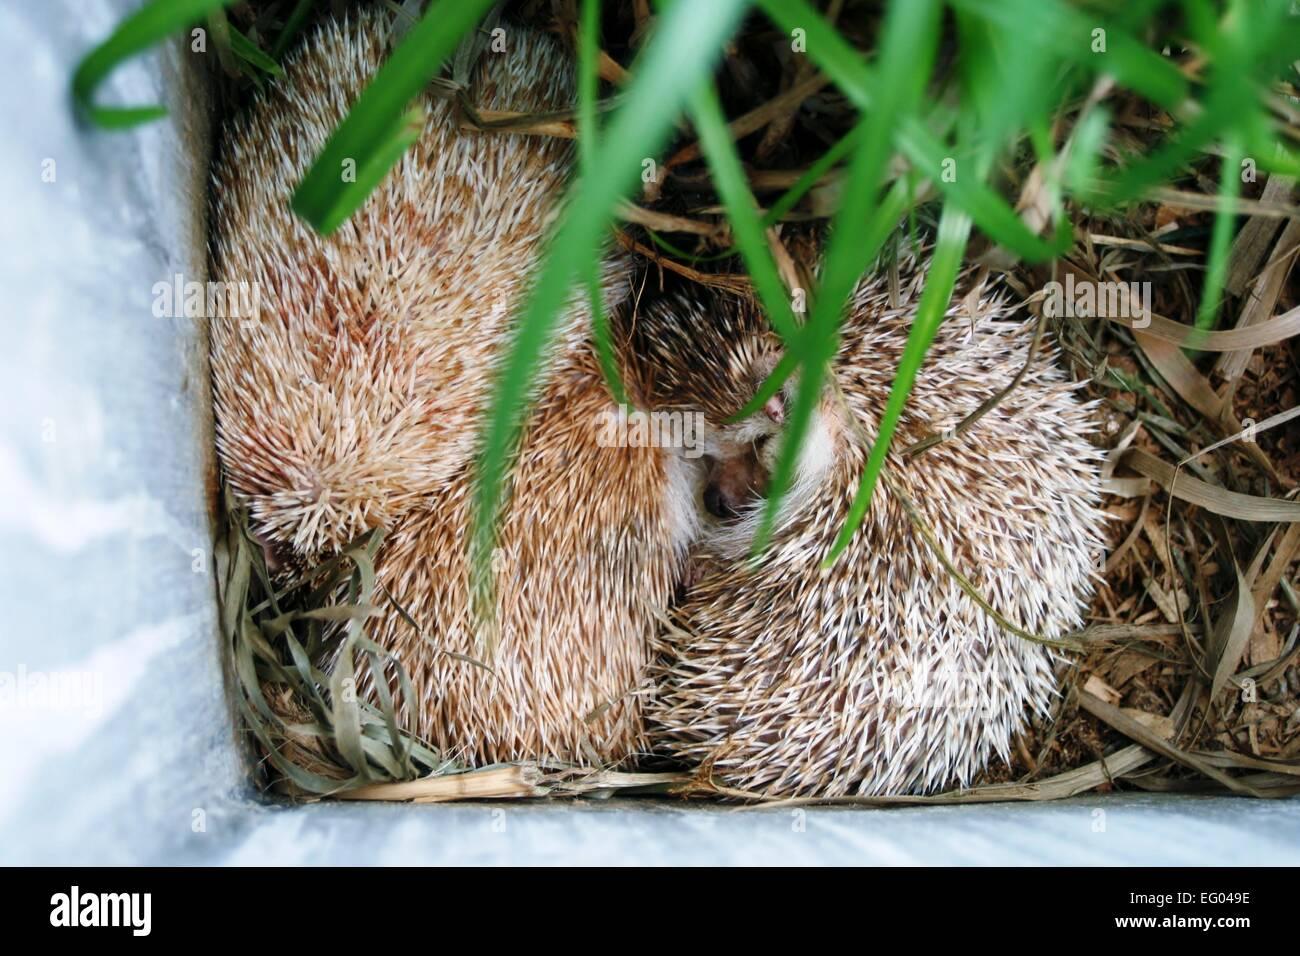 Albino Hedgehogs - Stock Image